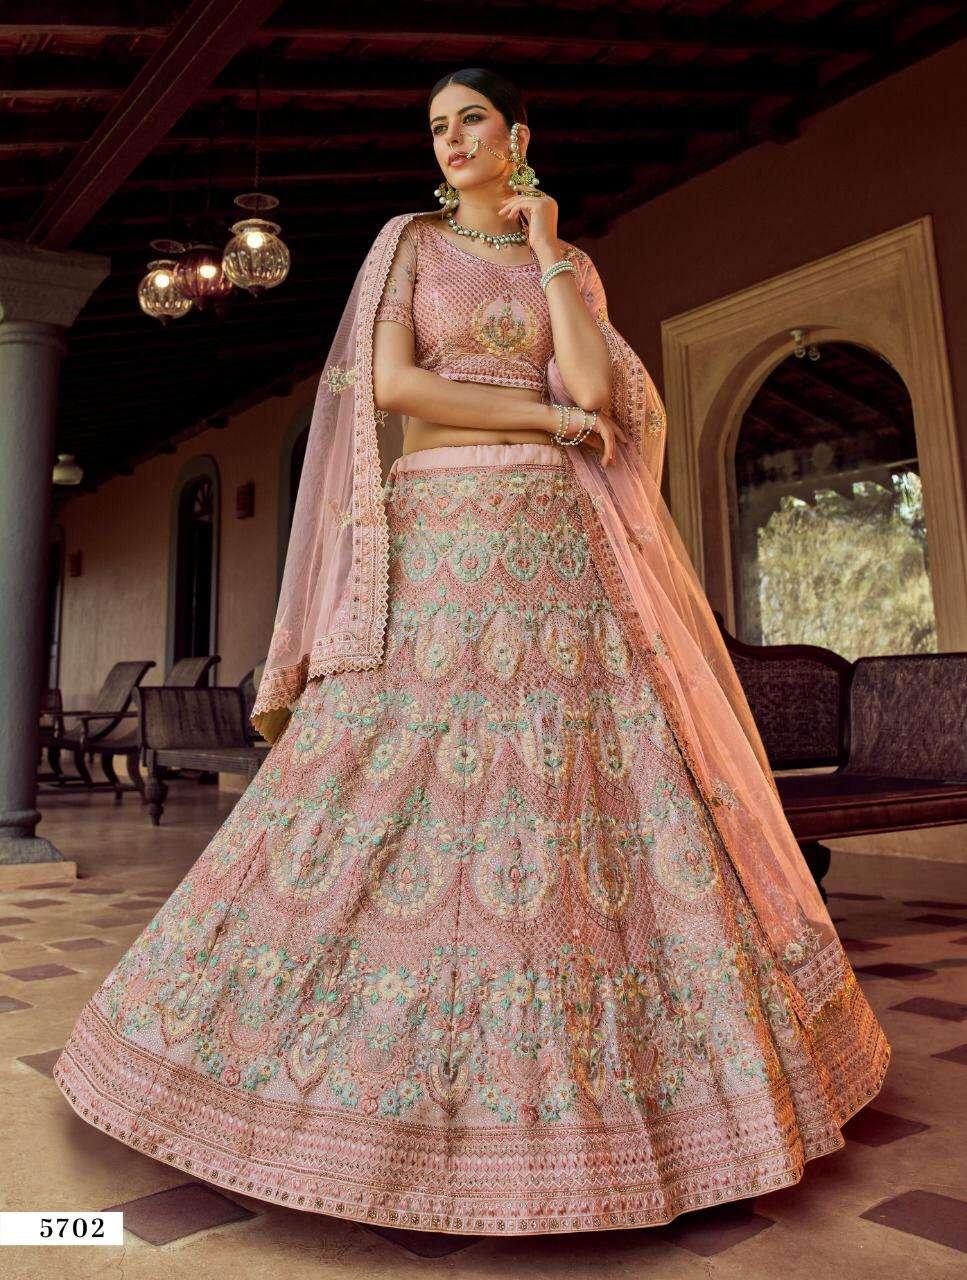 Arya Designs Vastry Vol 3 5701 to 5708 Series Heavy Work Bridal Lehenga Collection